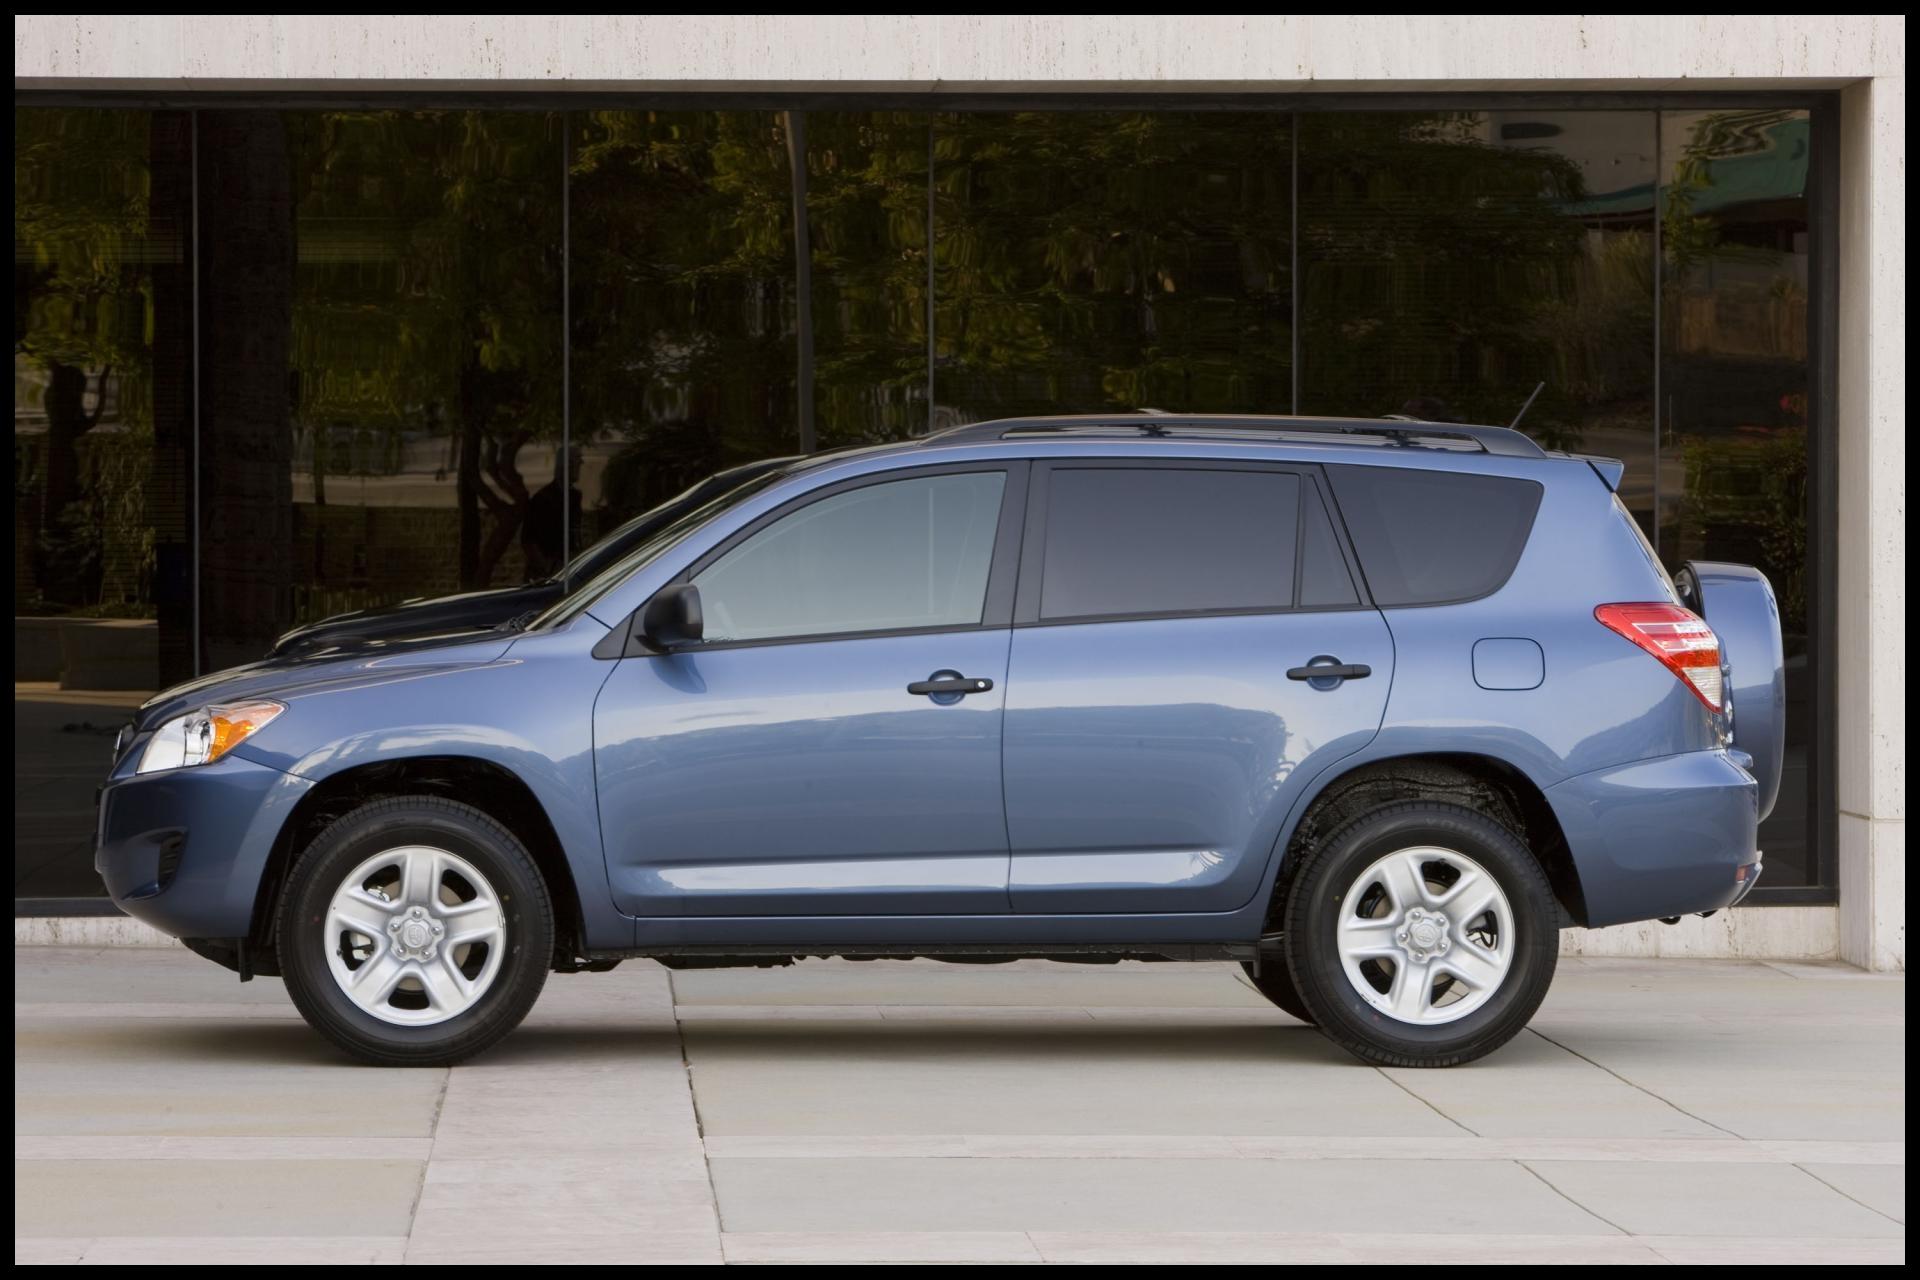 2012 Toyota RAV4 SUV Image 01